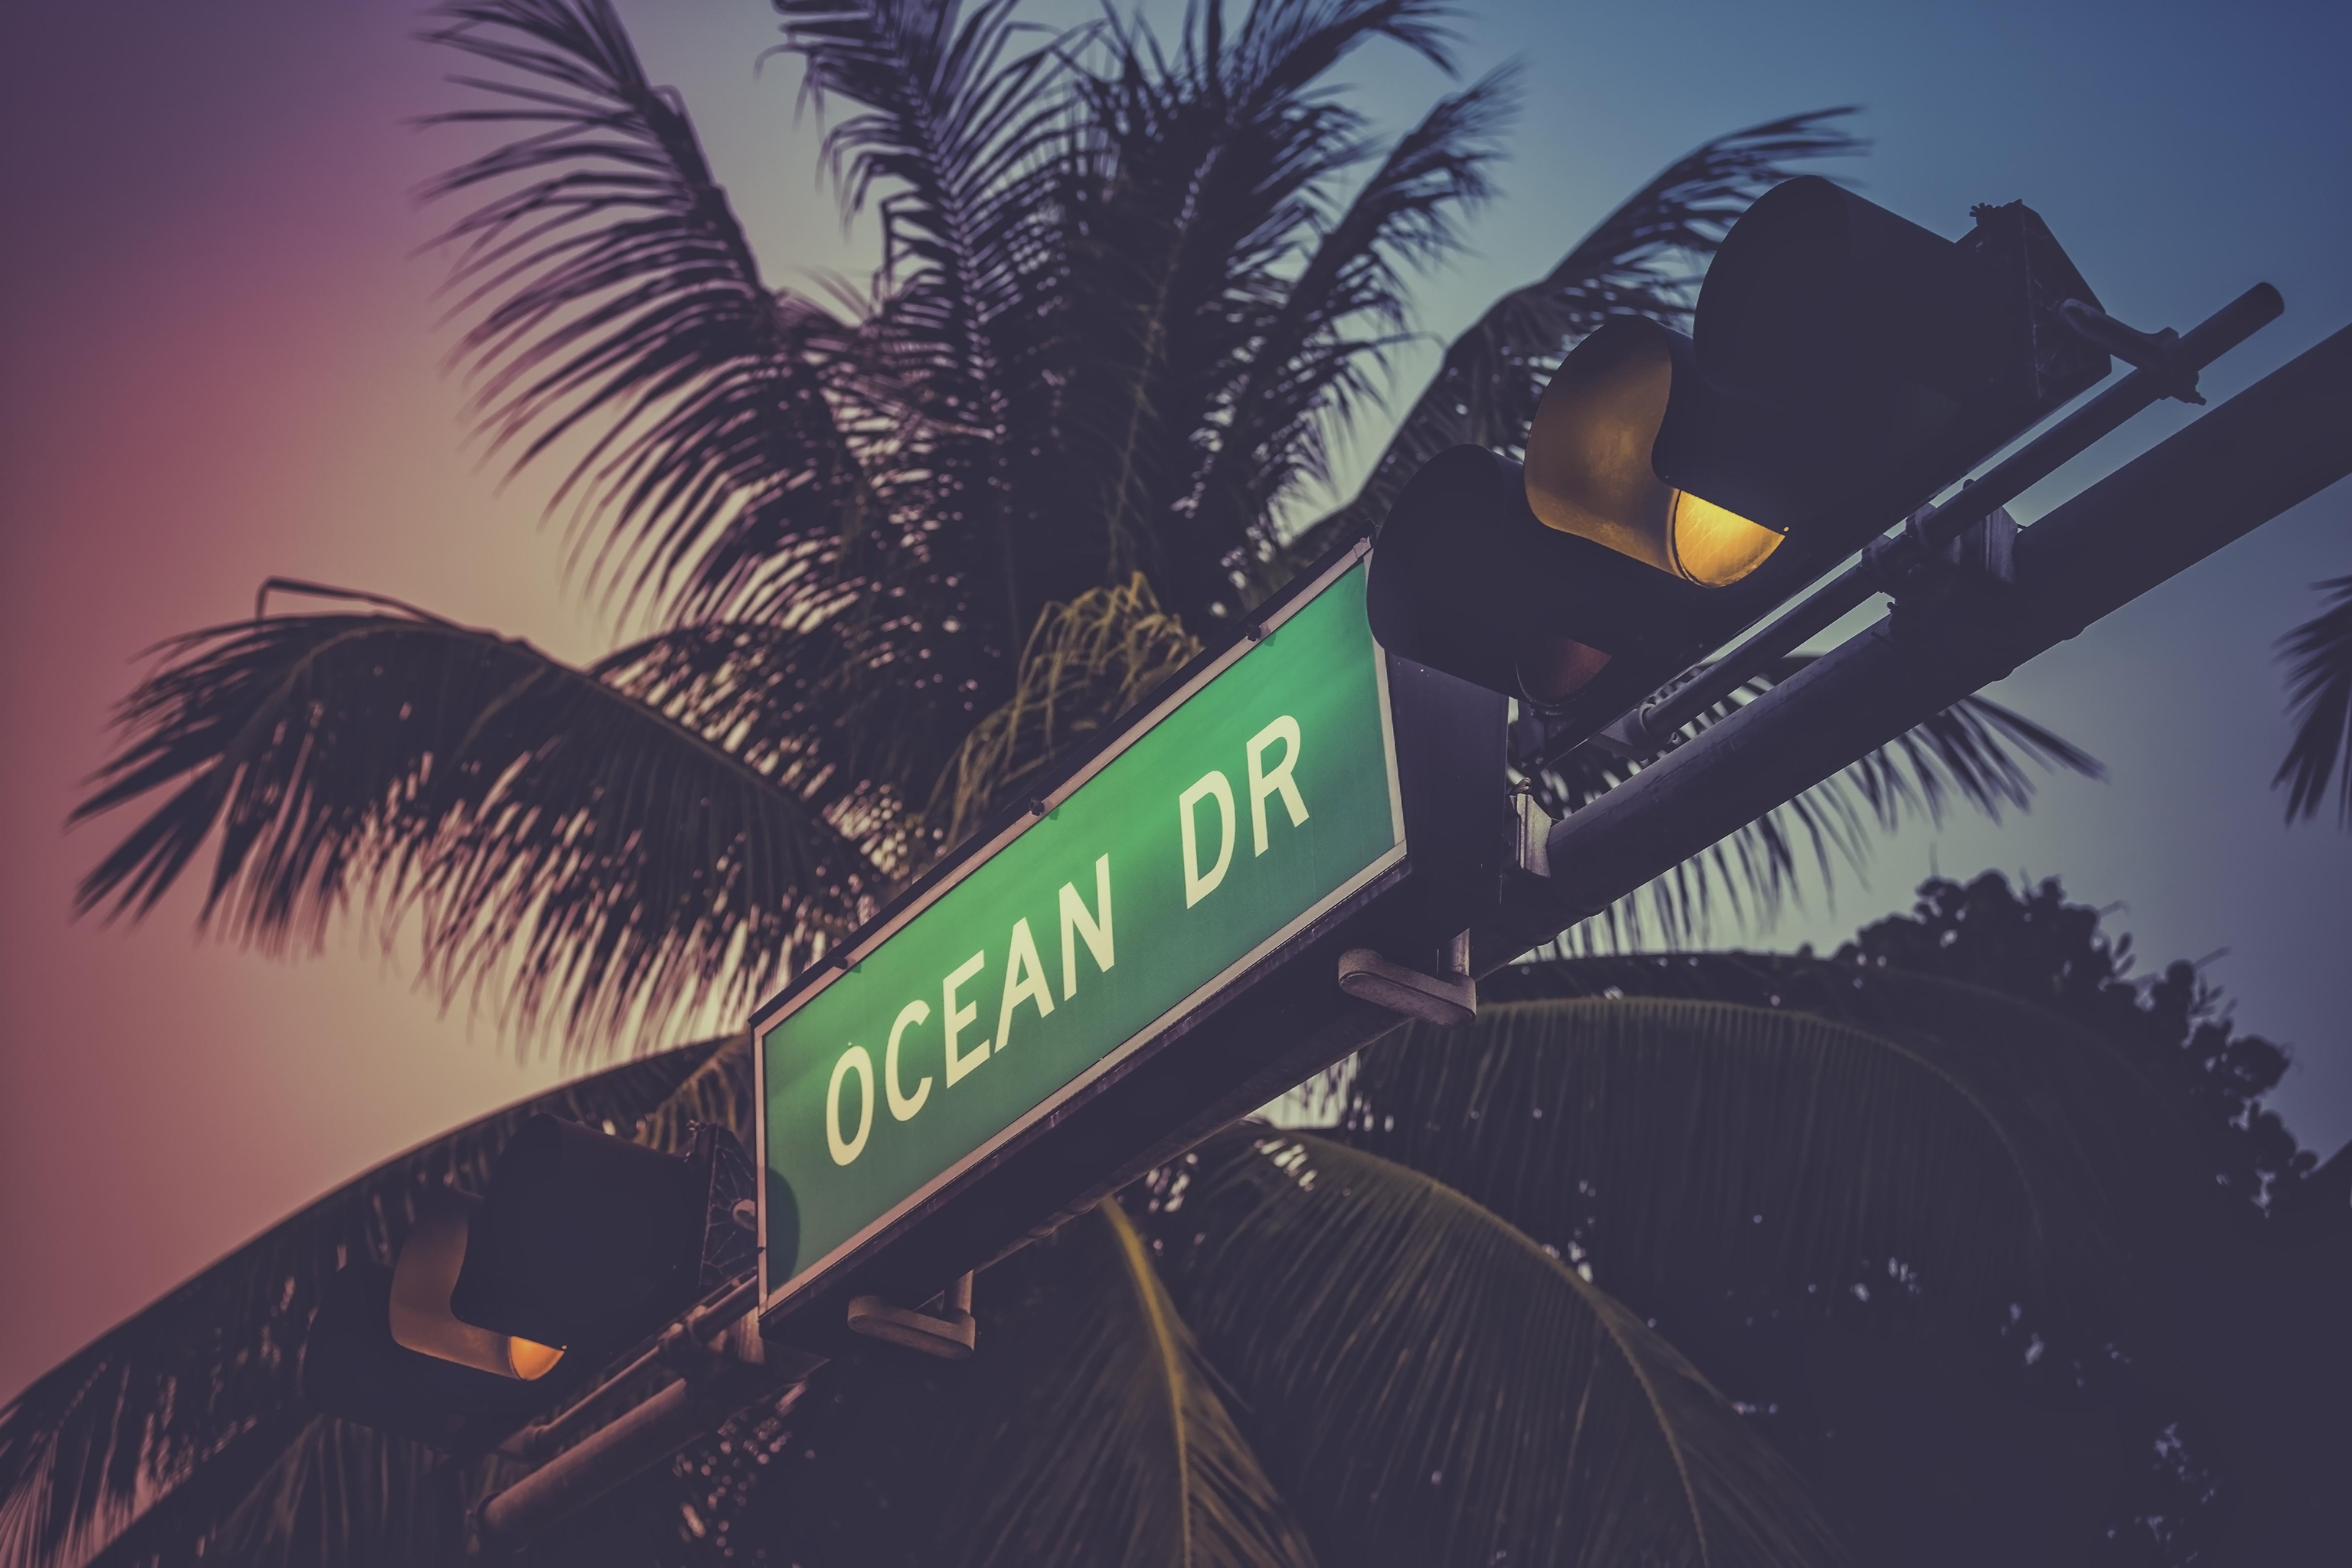 Ocean Drive sign in Miami Beach - Custom Wallpaper